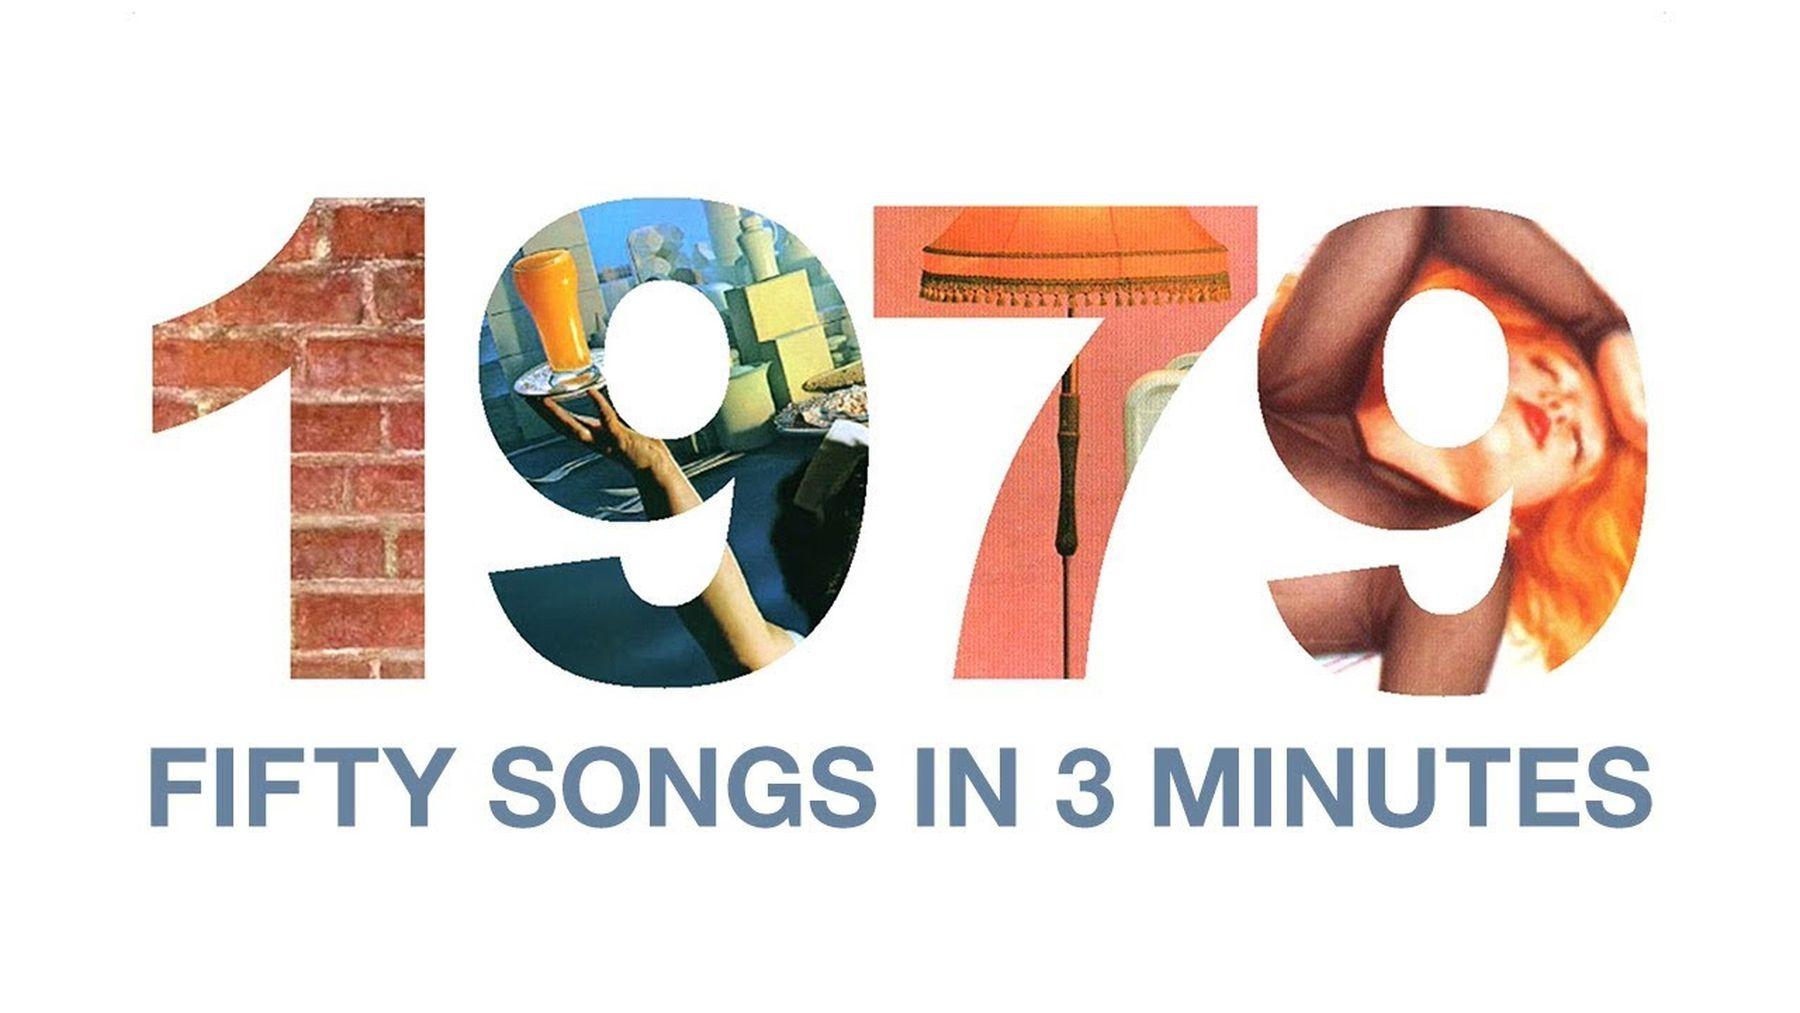 DIE Songs aus dem Jahr 1979 | Musik | Was is hier eigentlich los?